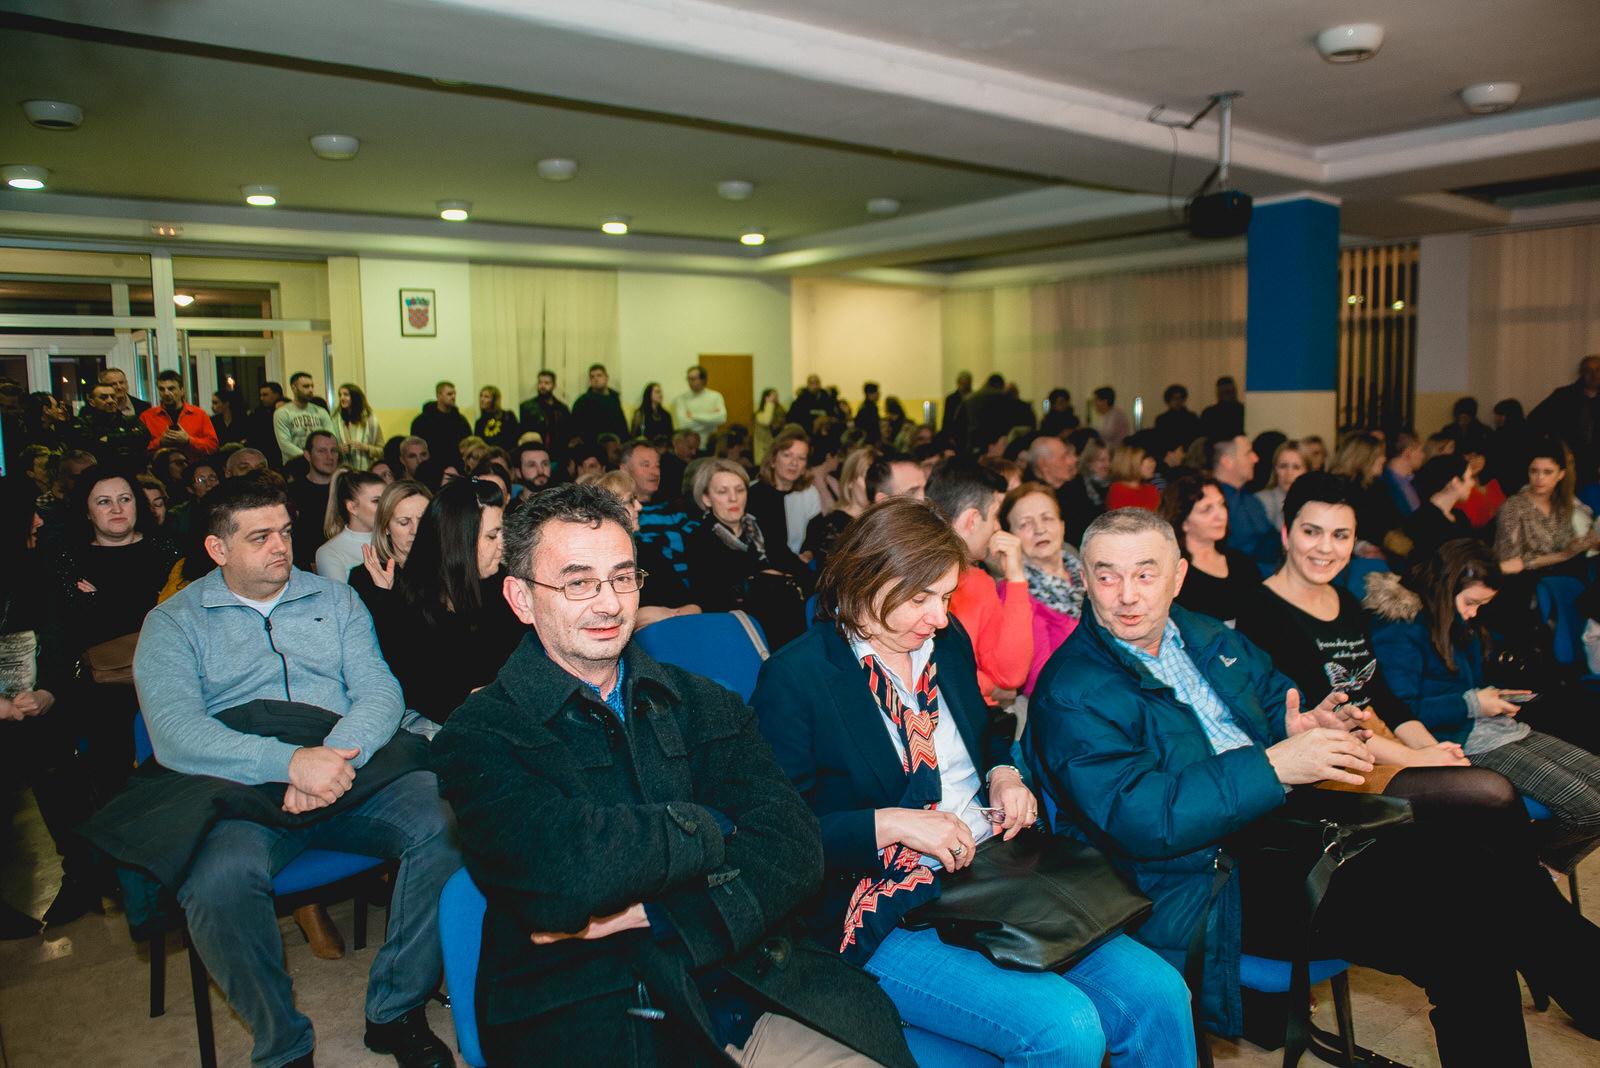 likaclub_koncert-klapa-cambi_kic-gospić_2019-1